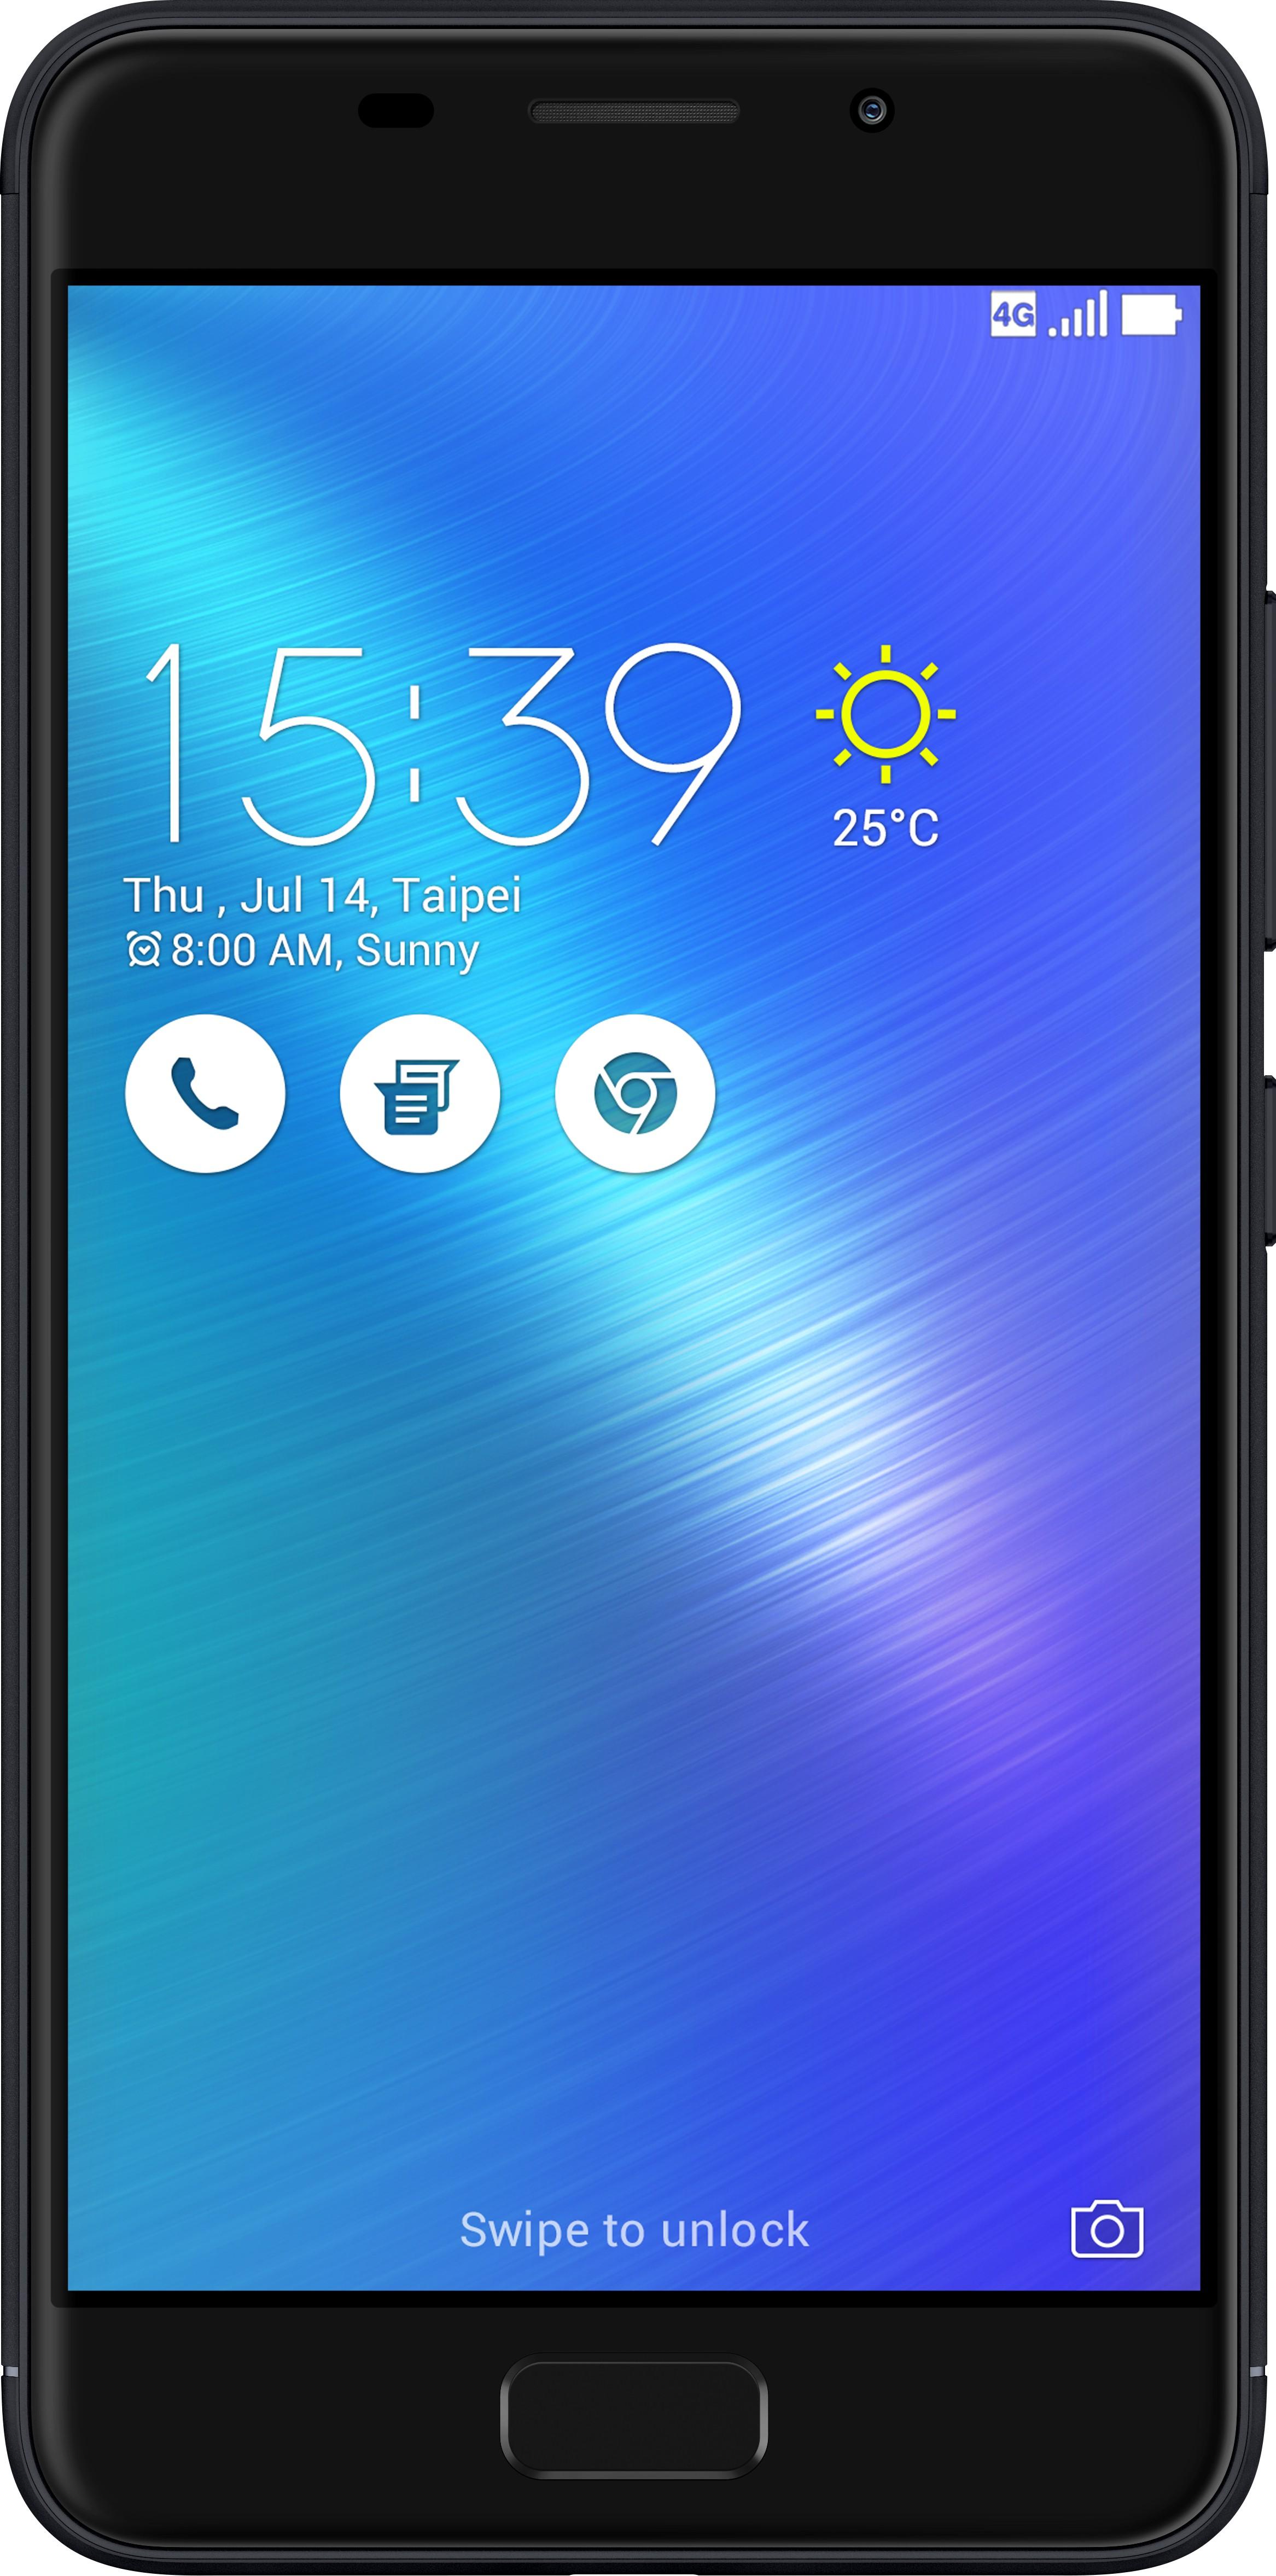 Asus Zenfone 3s Max (3GB RAM, 32GB)